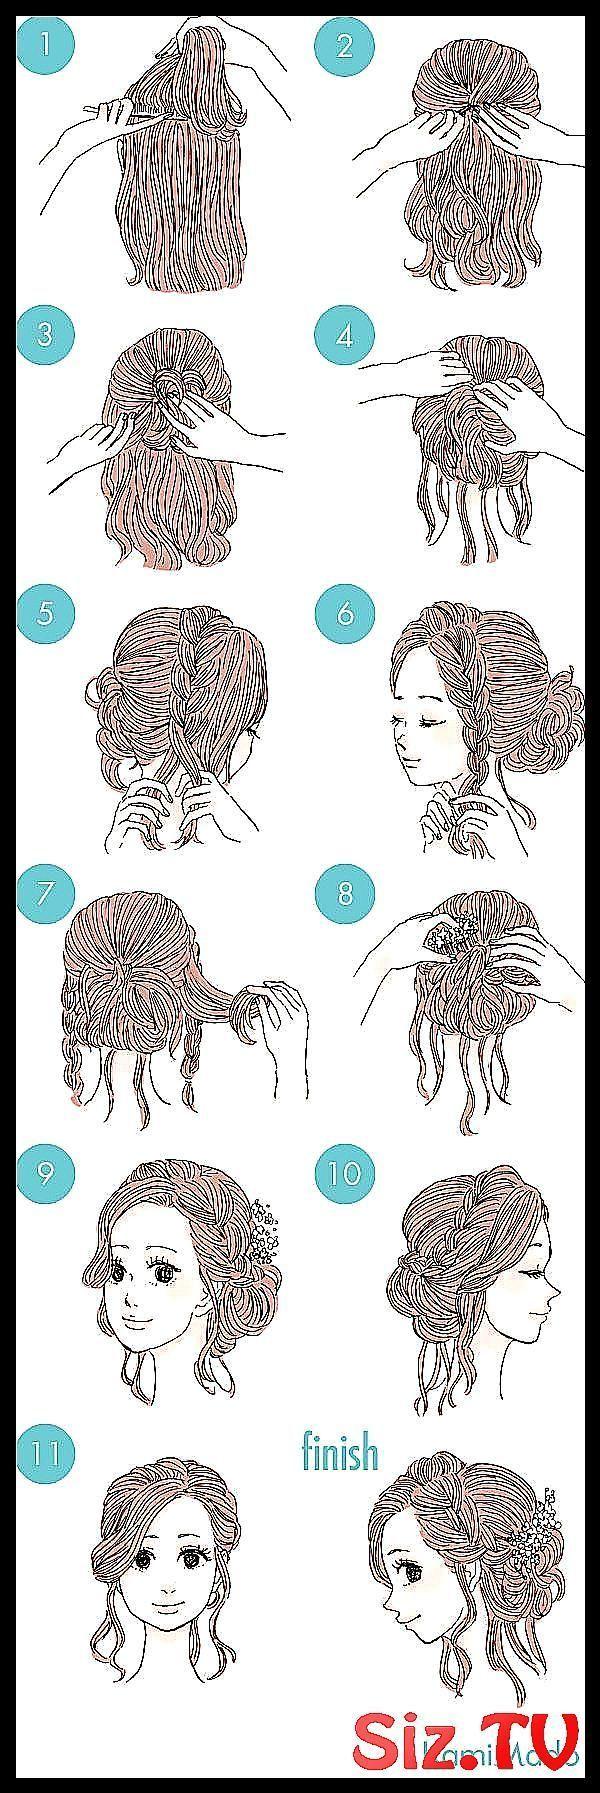 hair hairstyle updo formal elegant updo Hair Brai #Braids #elegant #elegant_Prom_Hair #Formal #Hair